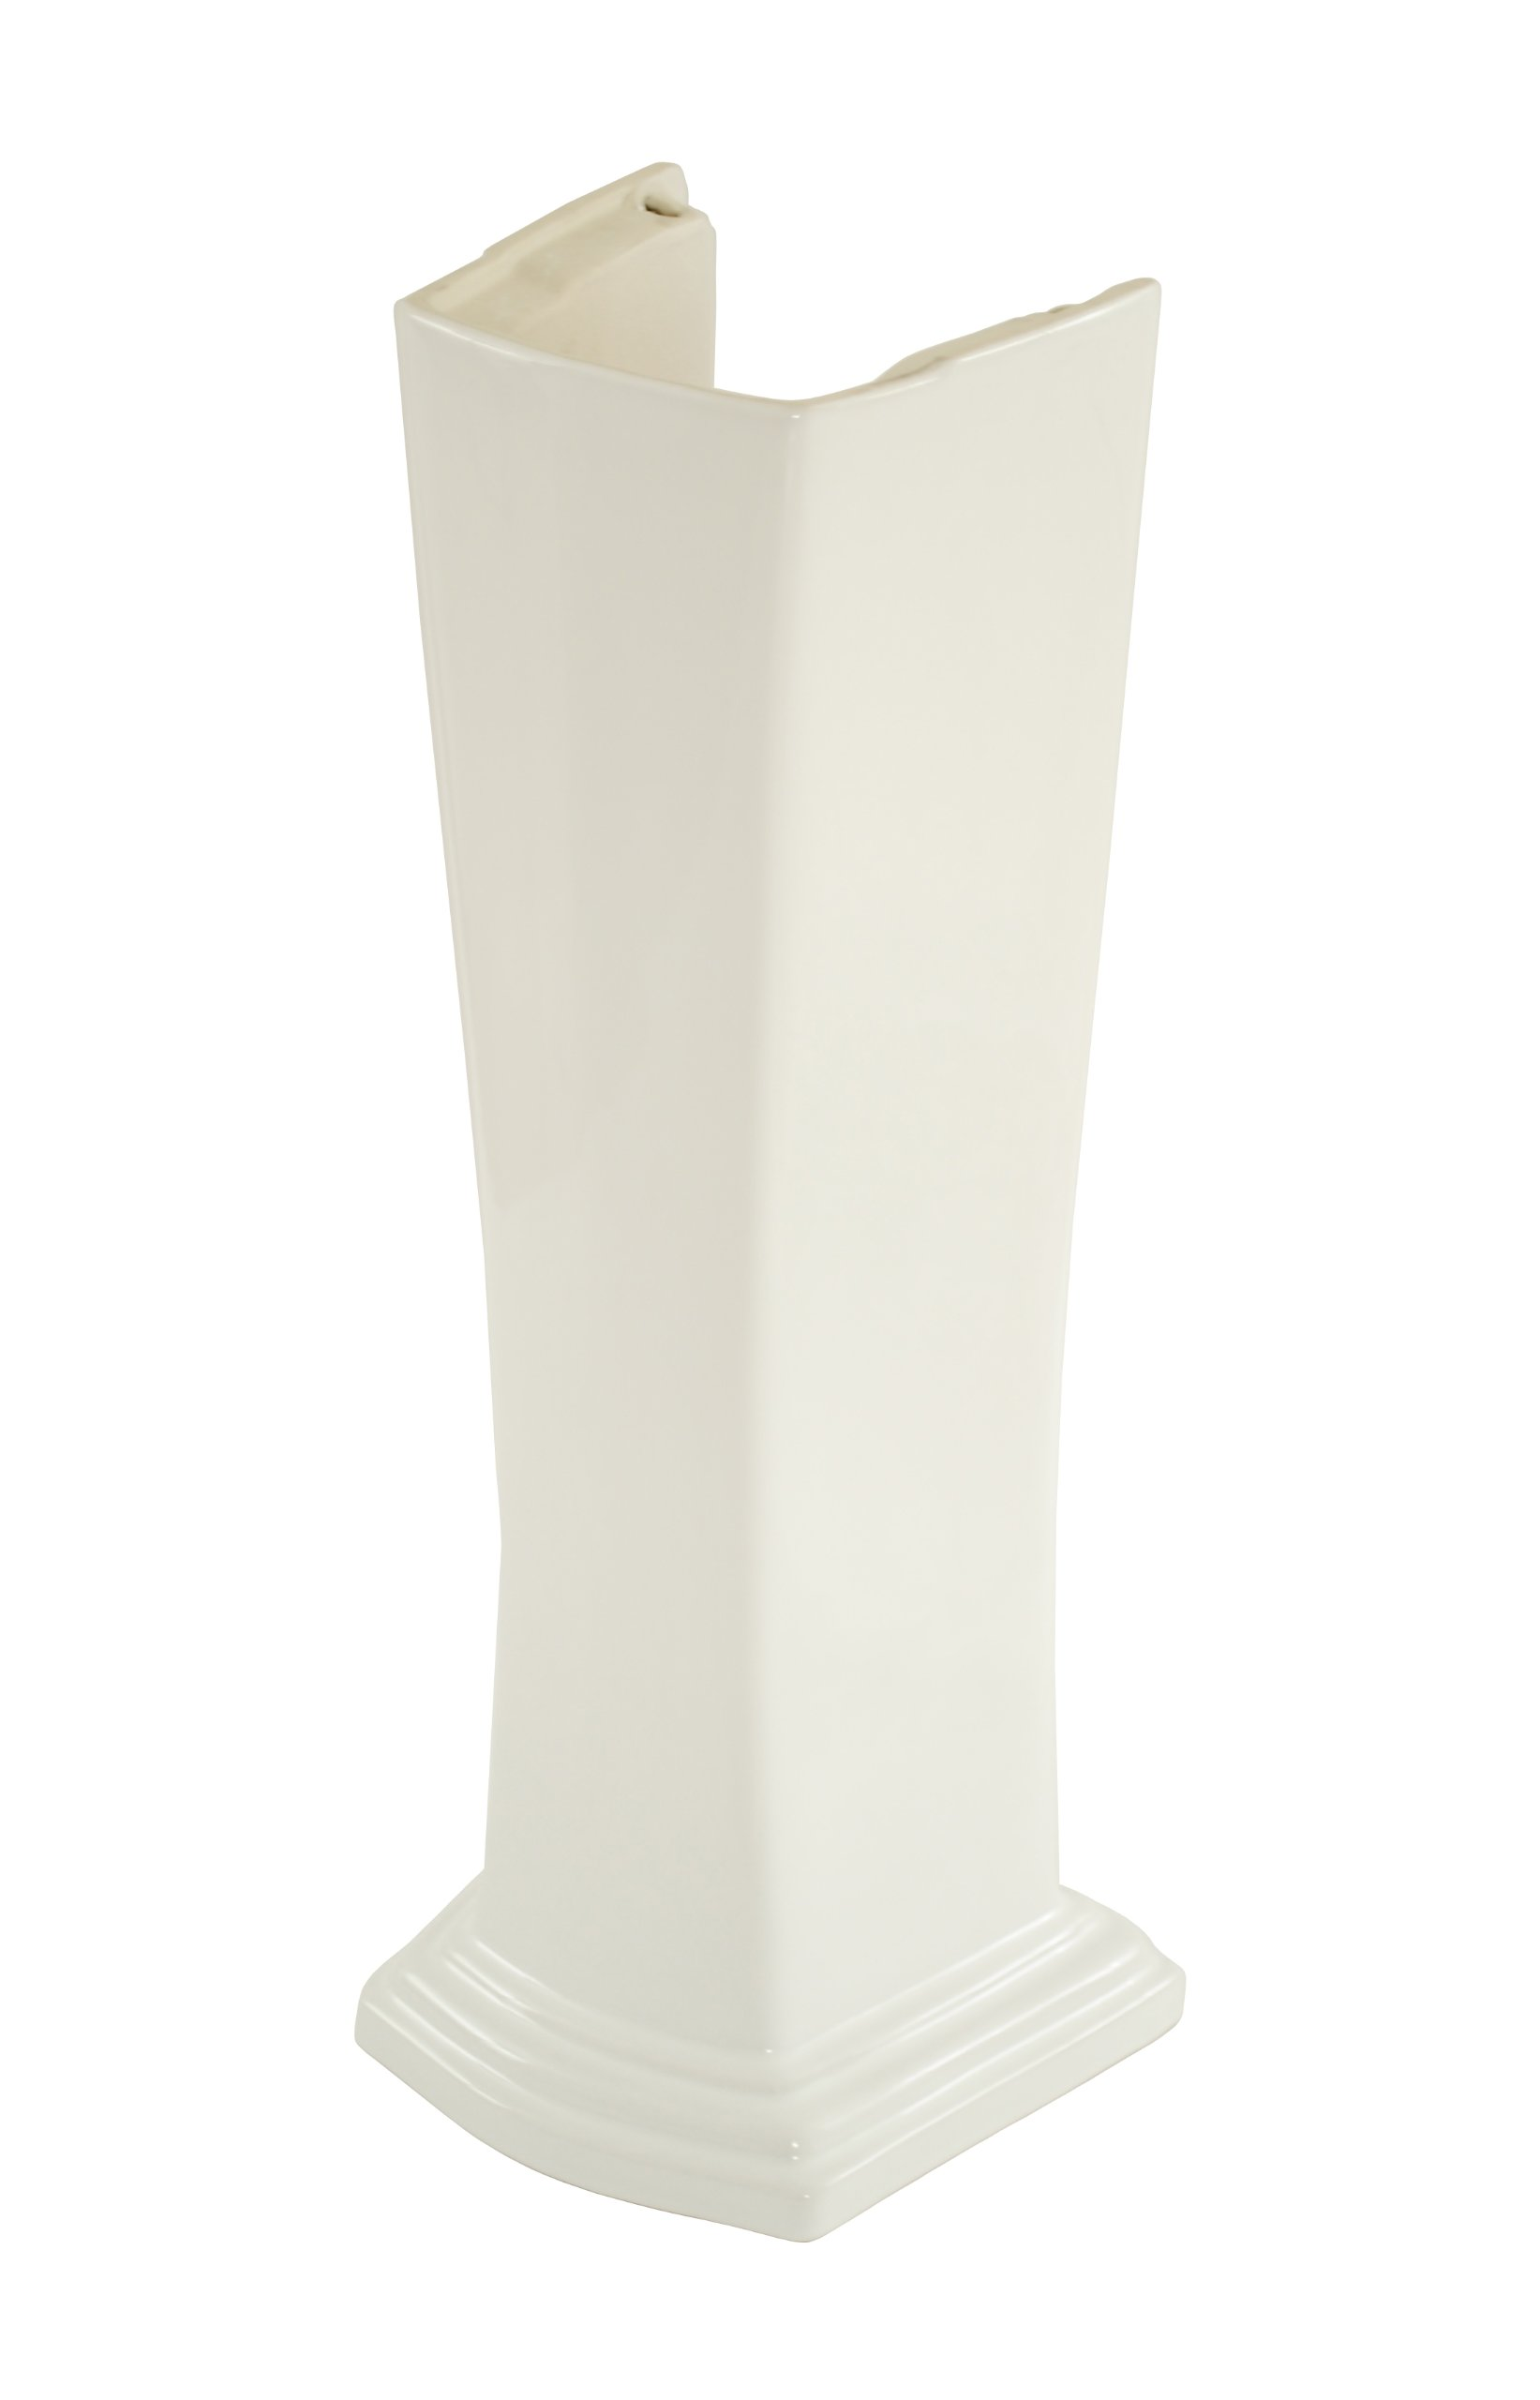 TOTO PT780#01 Clayton Pedestal Foot, Cotton White by TOTO